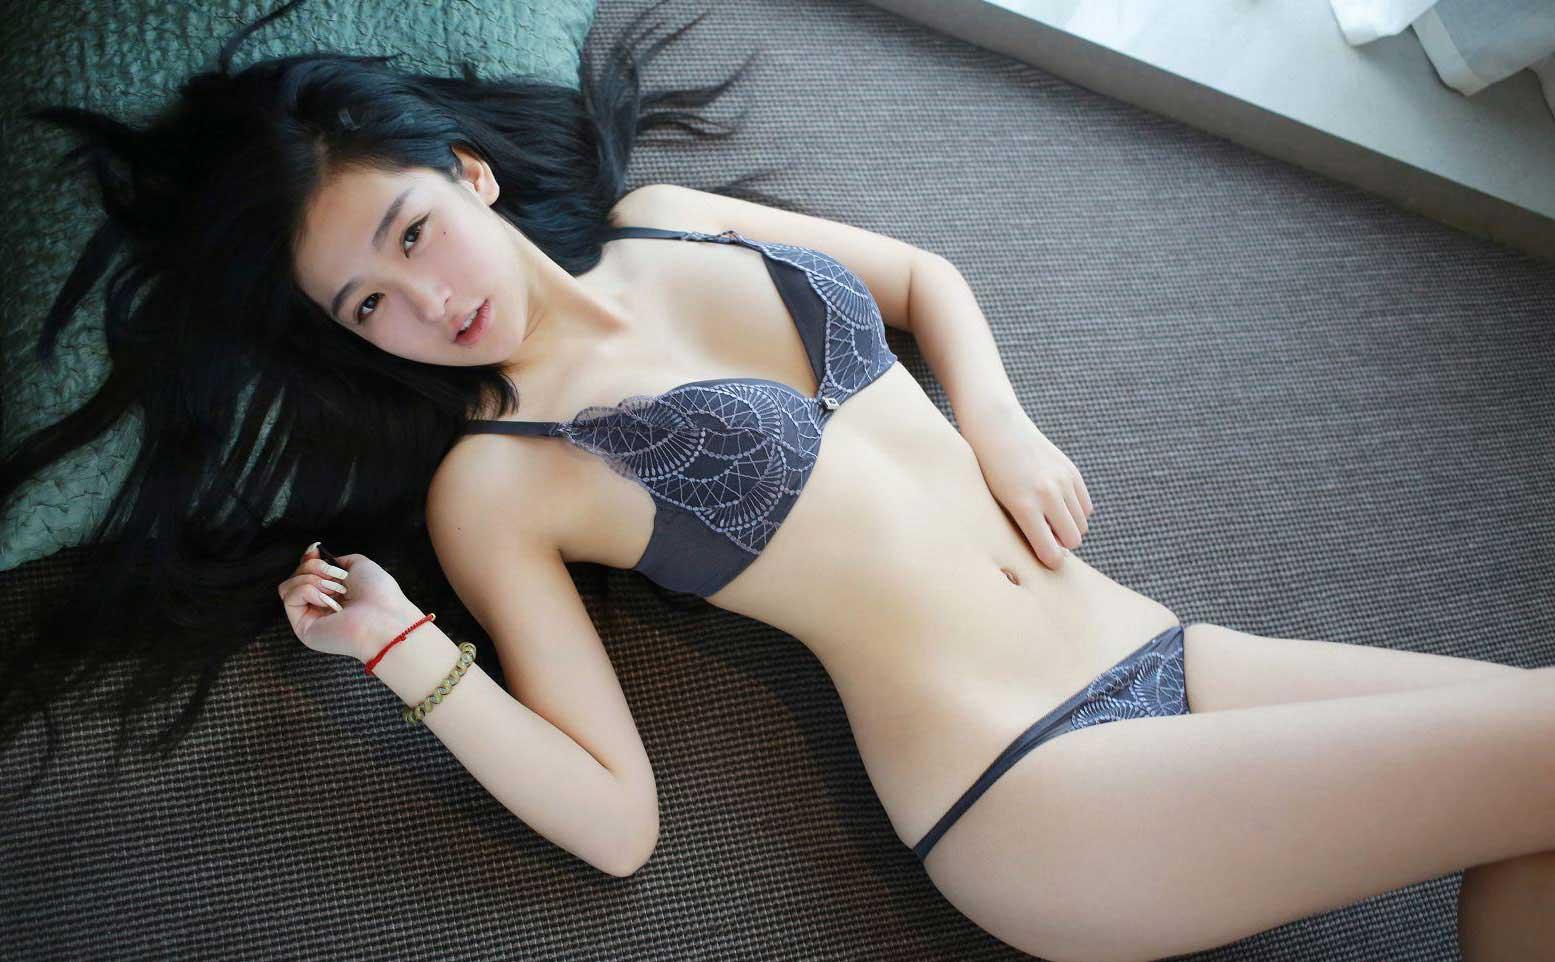 Asia massage central london